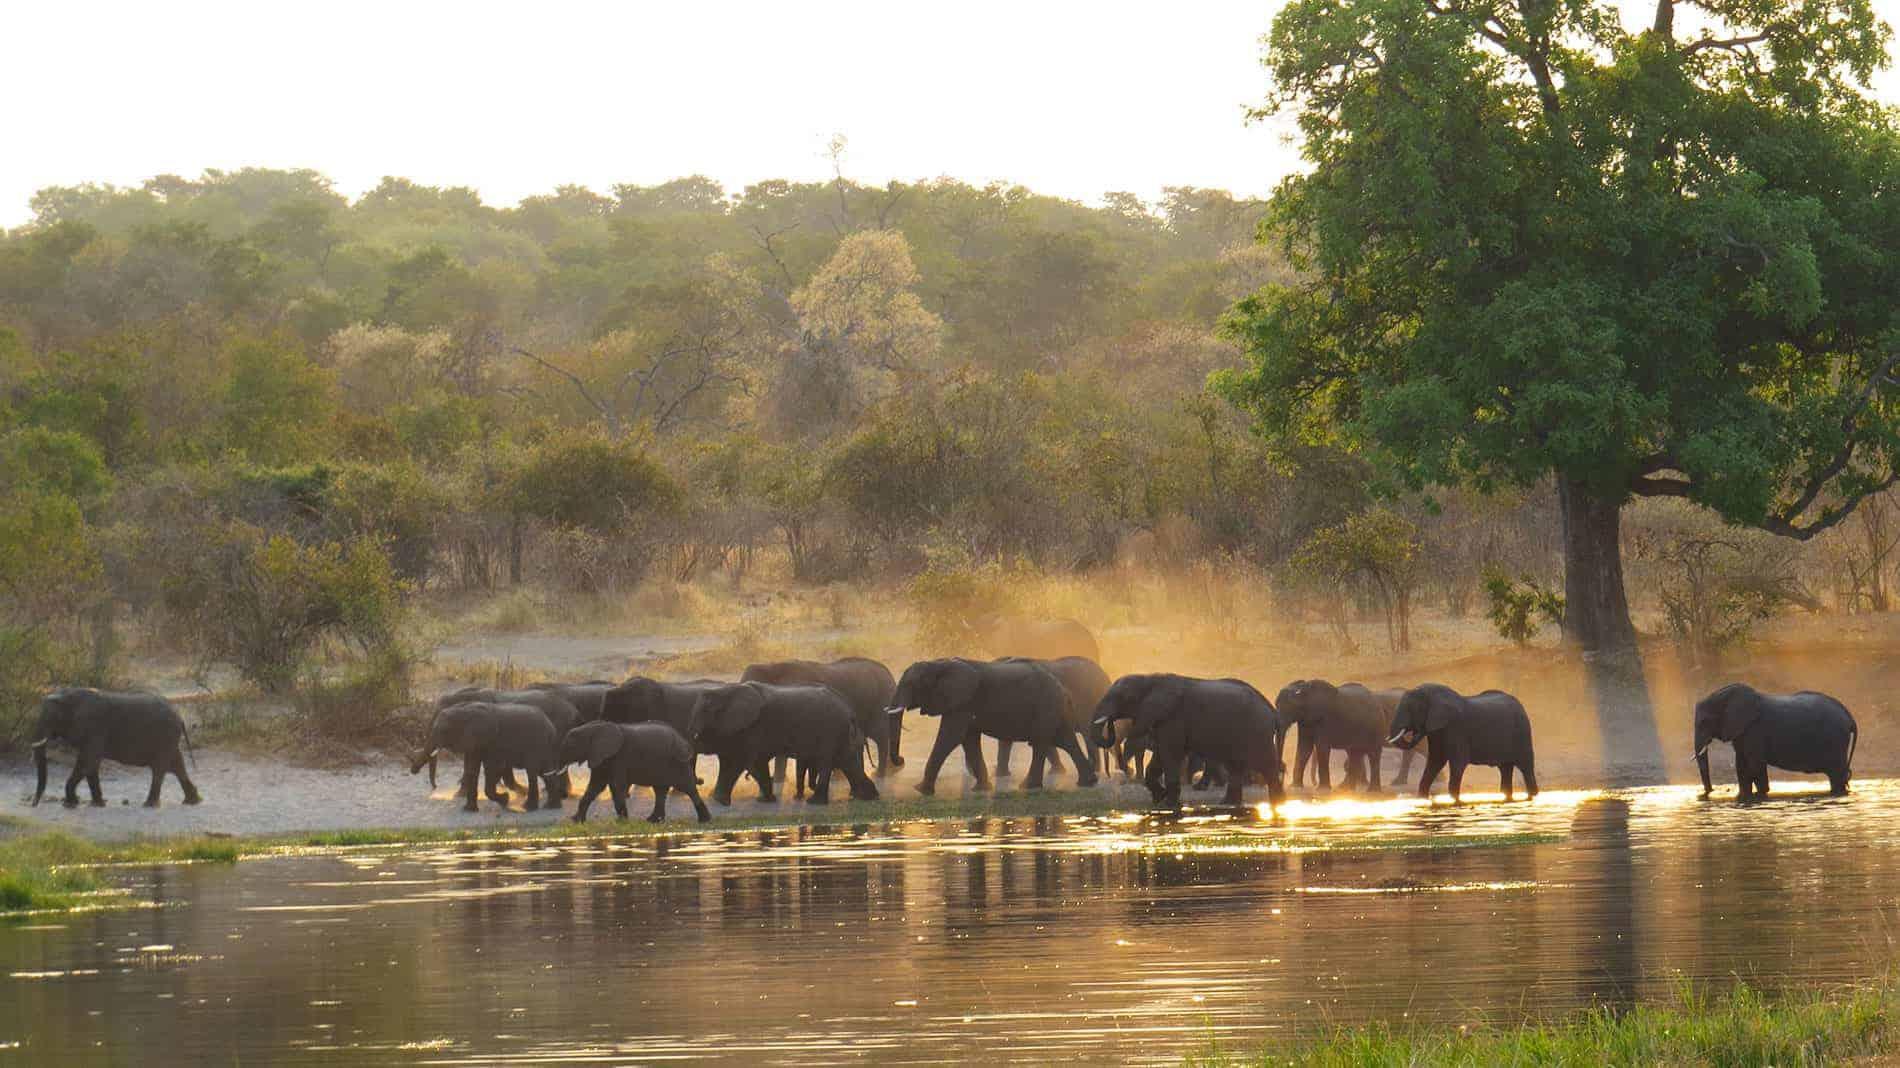 Trip Report - Caprivi Strip, Namibia Self Drive - Bushlore